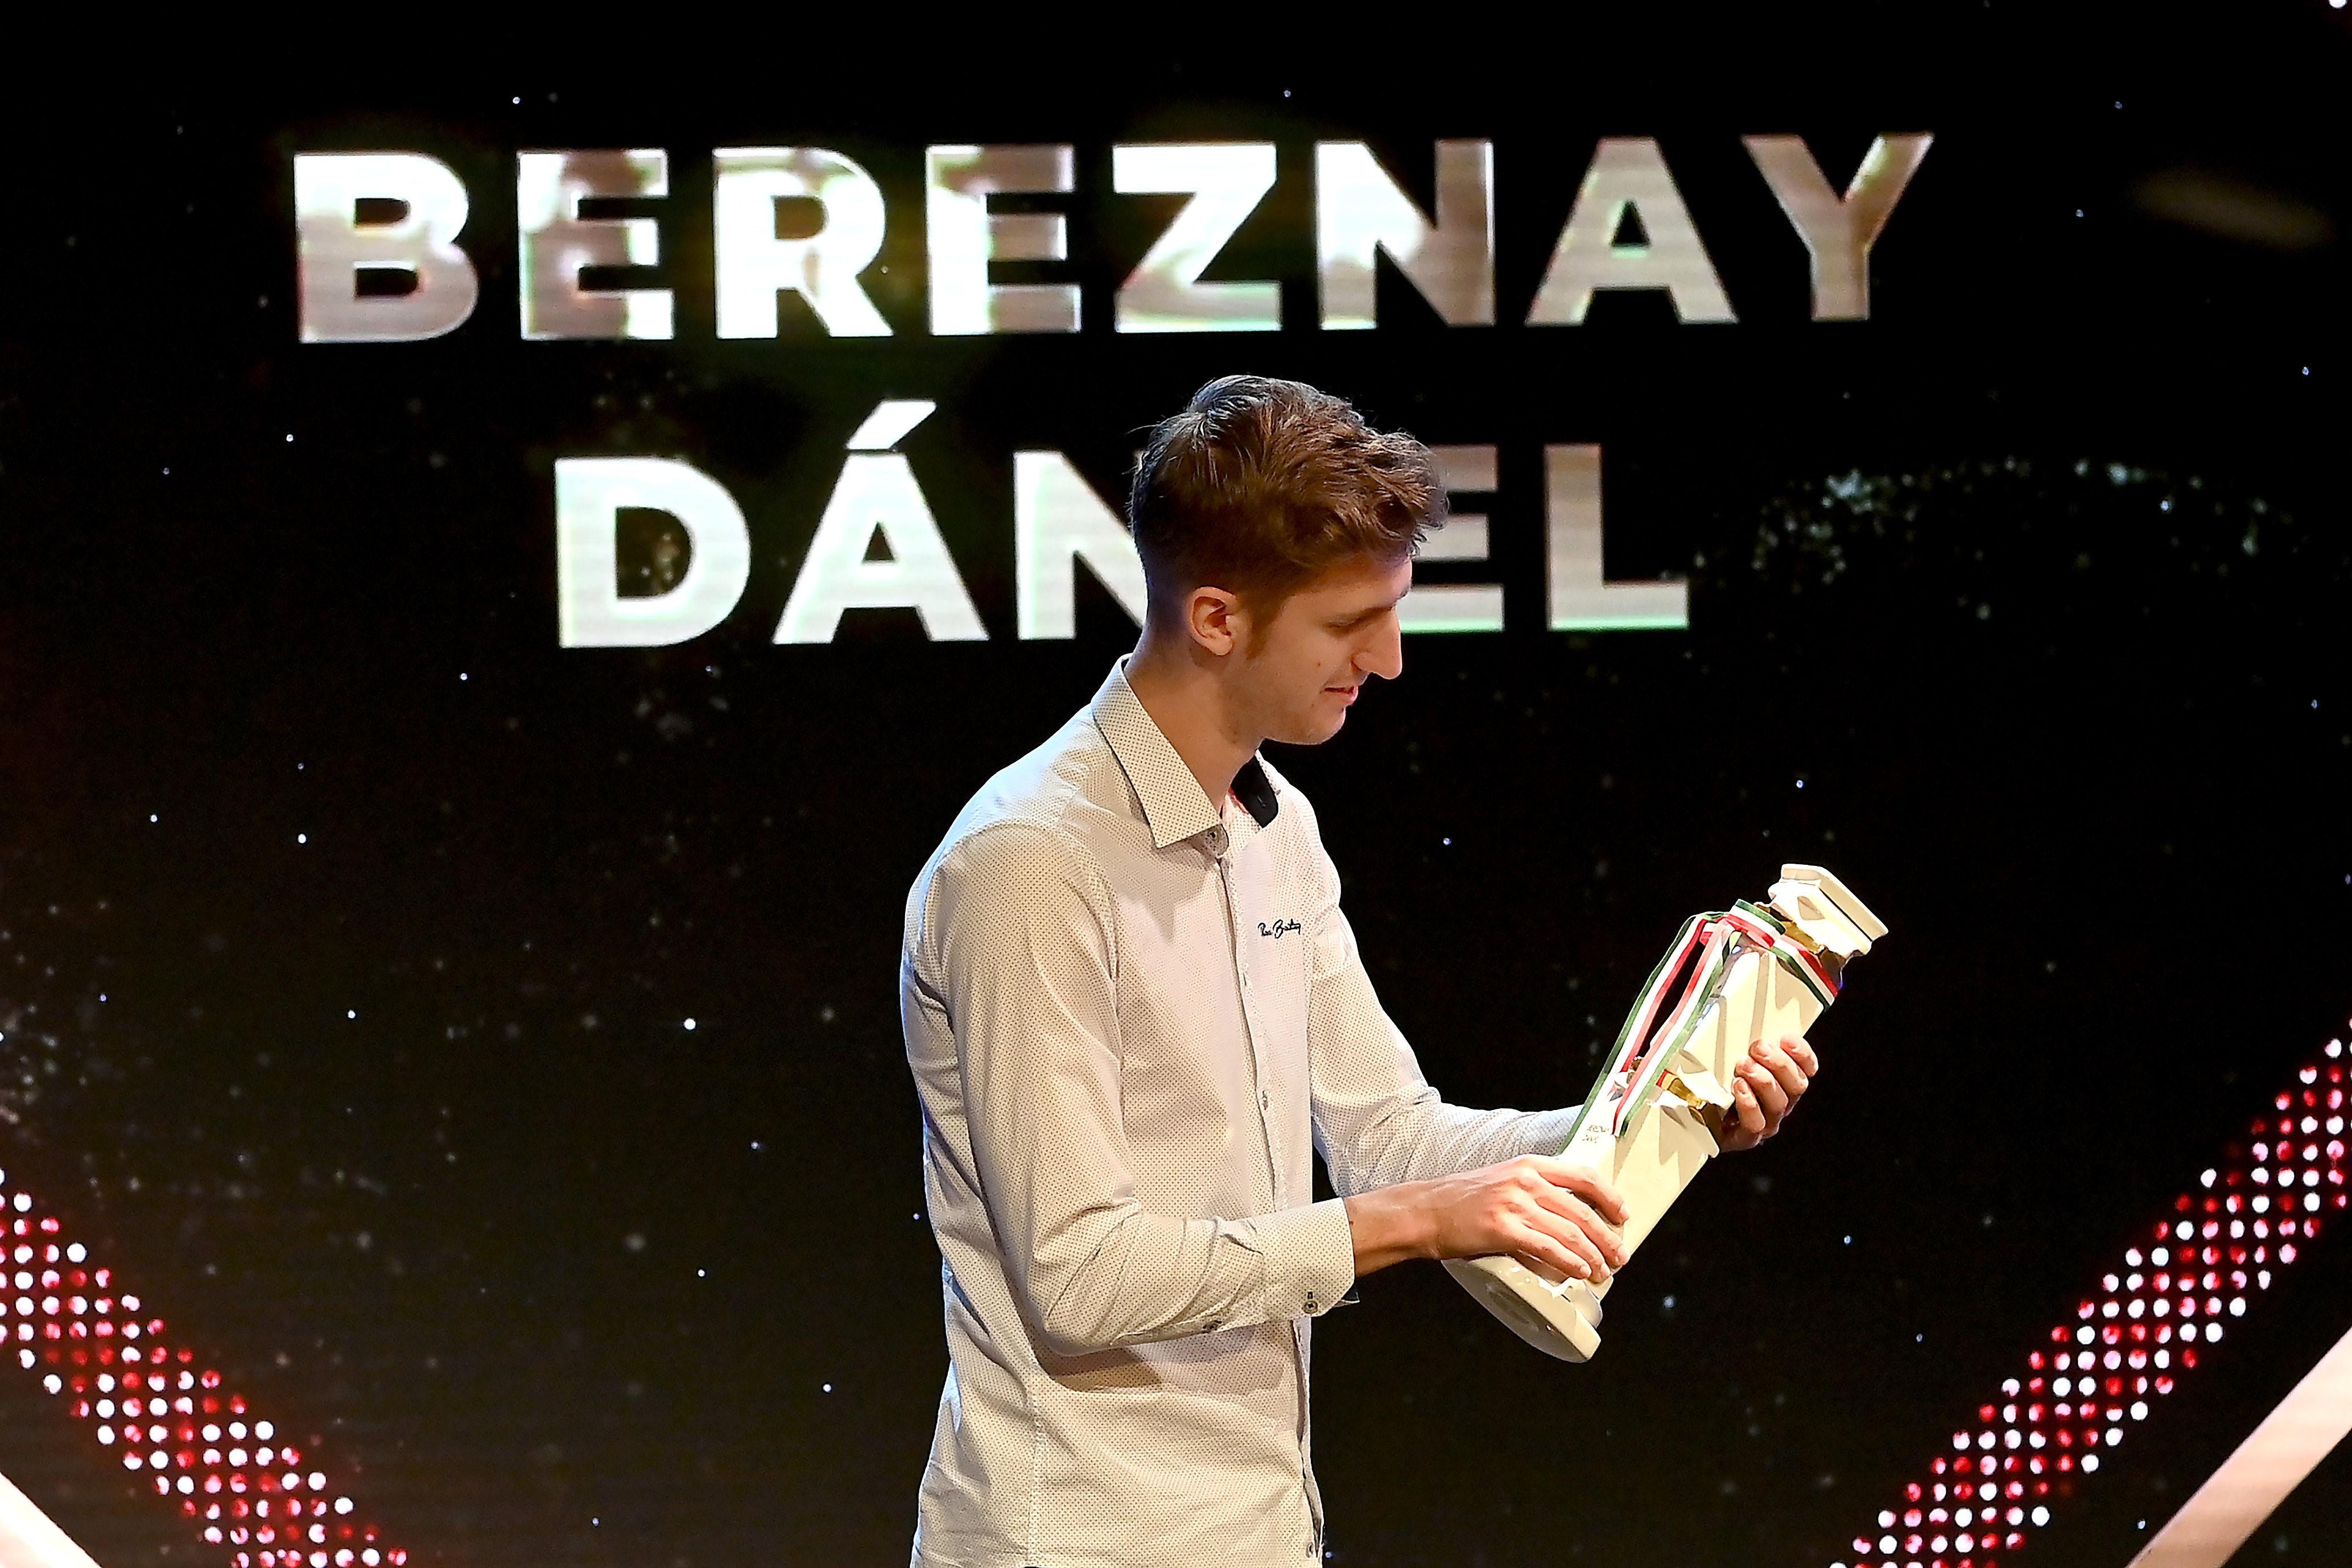 bereznay-ev-sportoloja-2020-mti.jpg